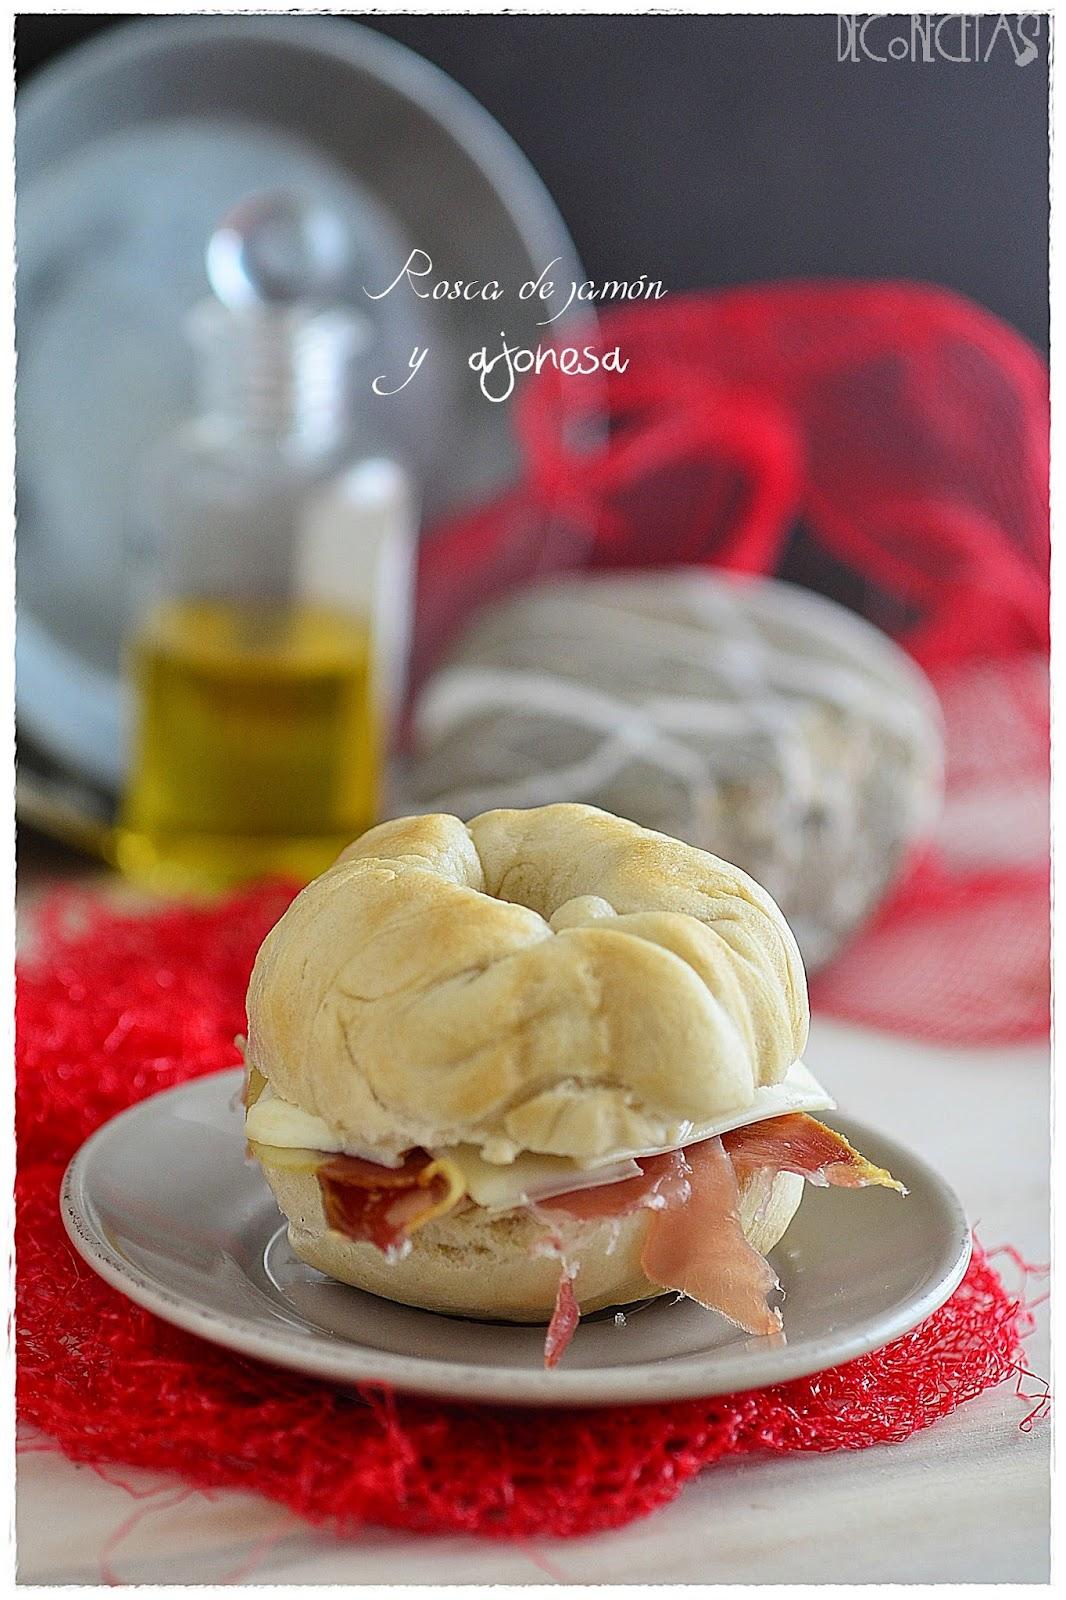 Rosca de jamón y ajonesa